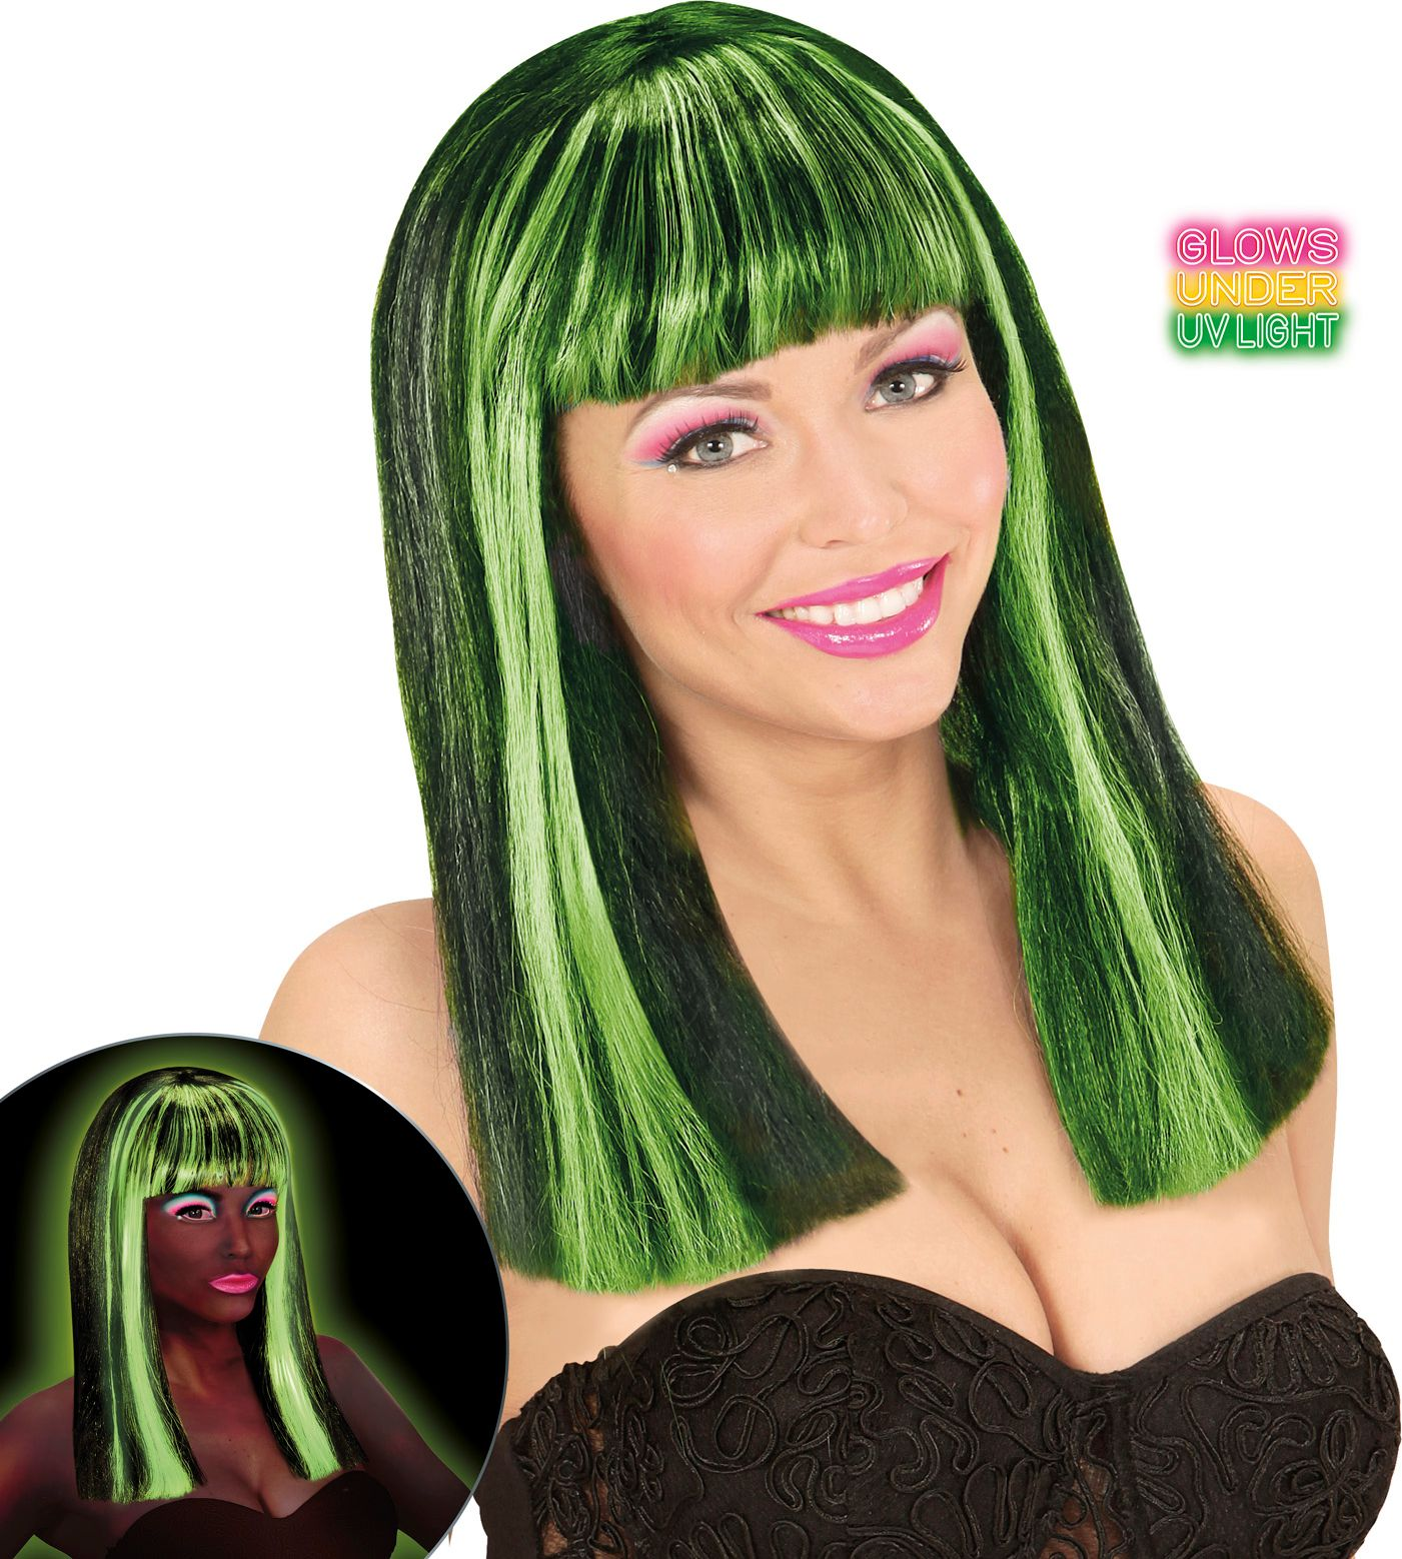 Neon groene gestreepte pruik